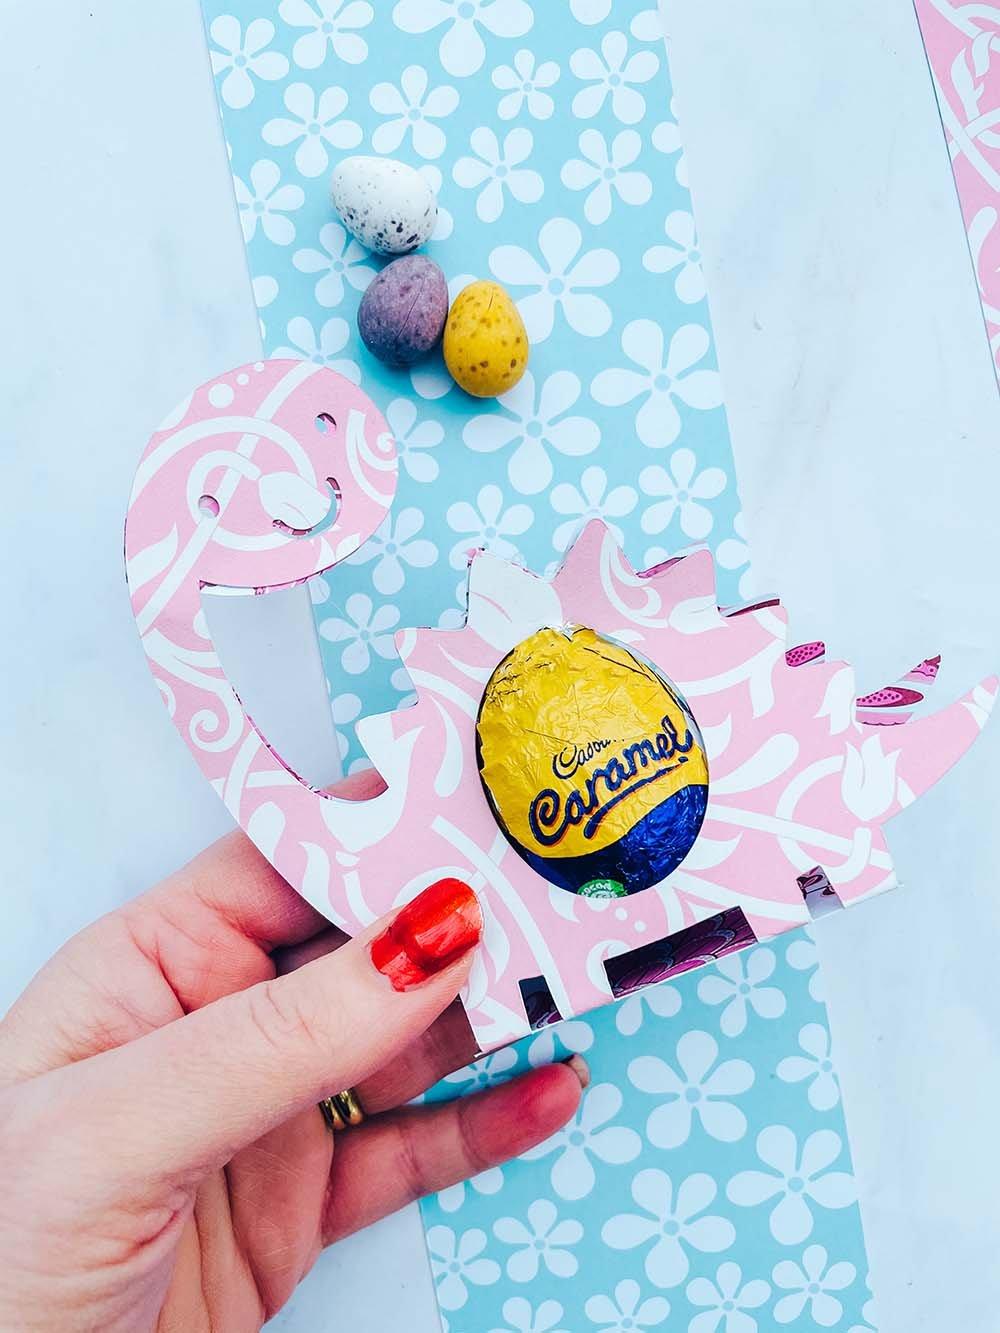 Downloadable Cricut Template For A Castle Easter Egg Holder